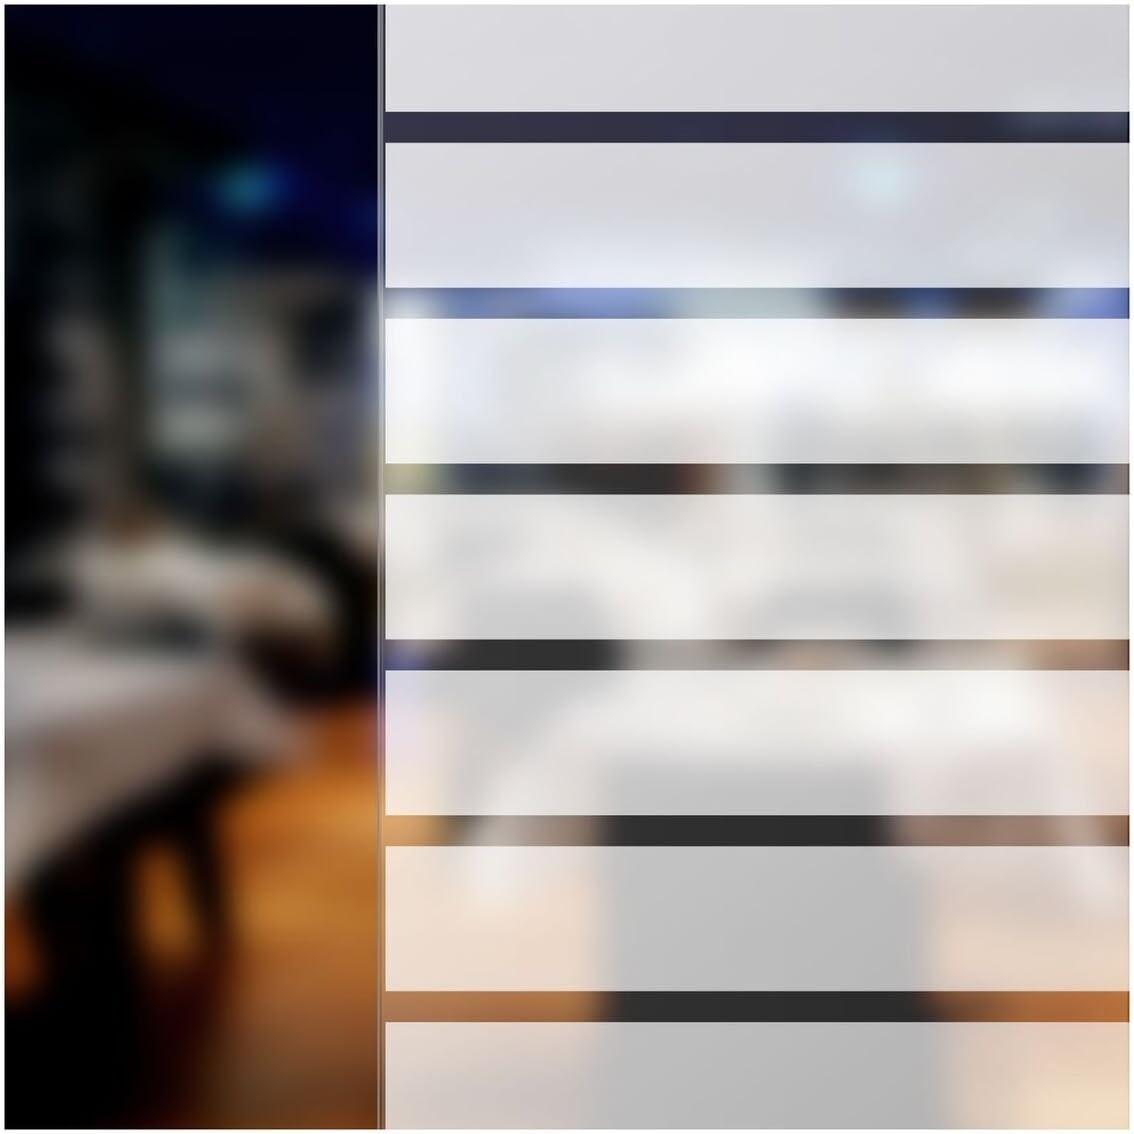 BDF BLP Window Film Blind Plus 1 3 4 Inch Wide Blinds – 60in X 25ft